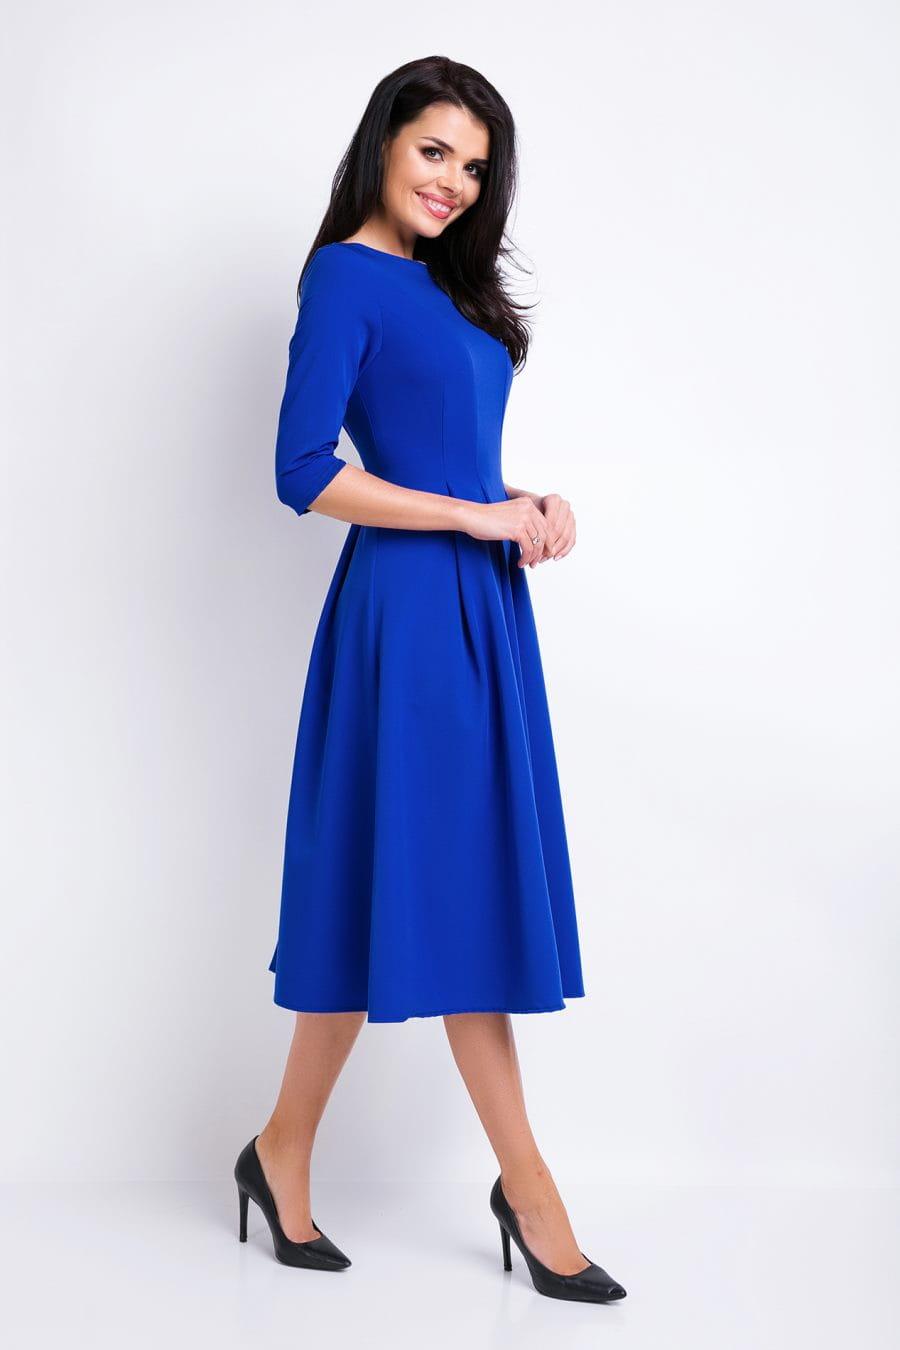 b558bbbe33 Elegancka Sukienka Midi Niebieska AW159 BESIMA.pl